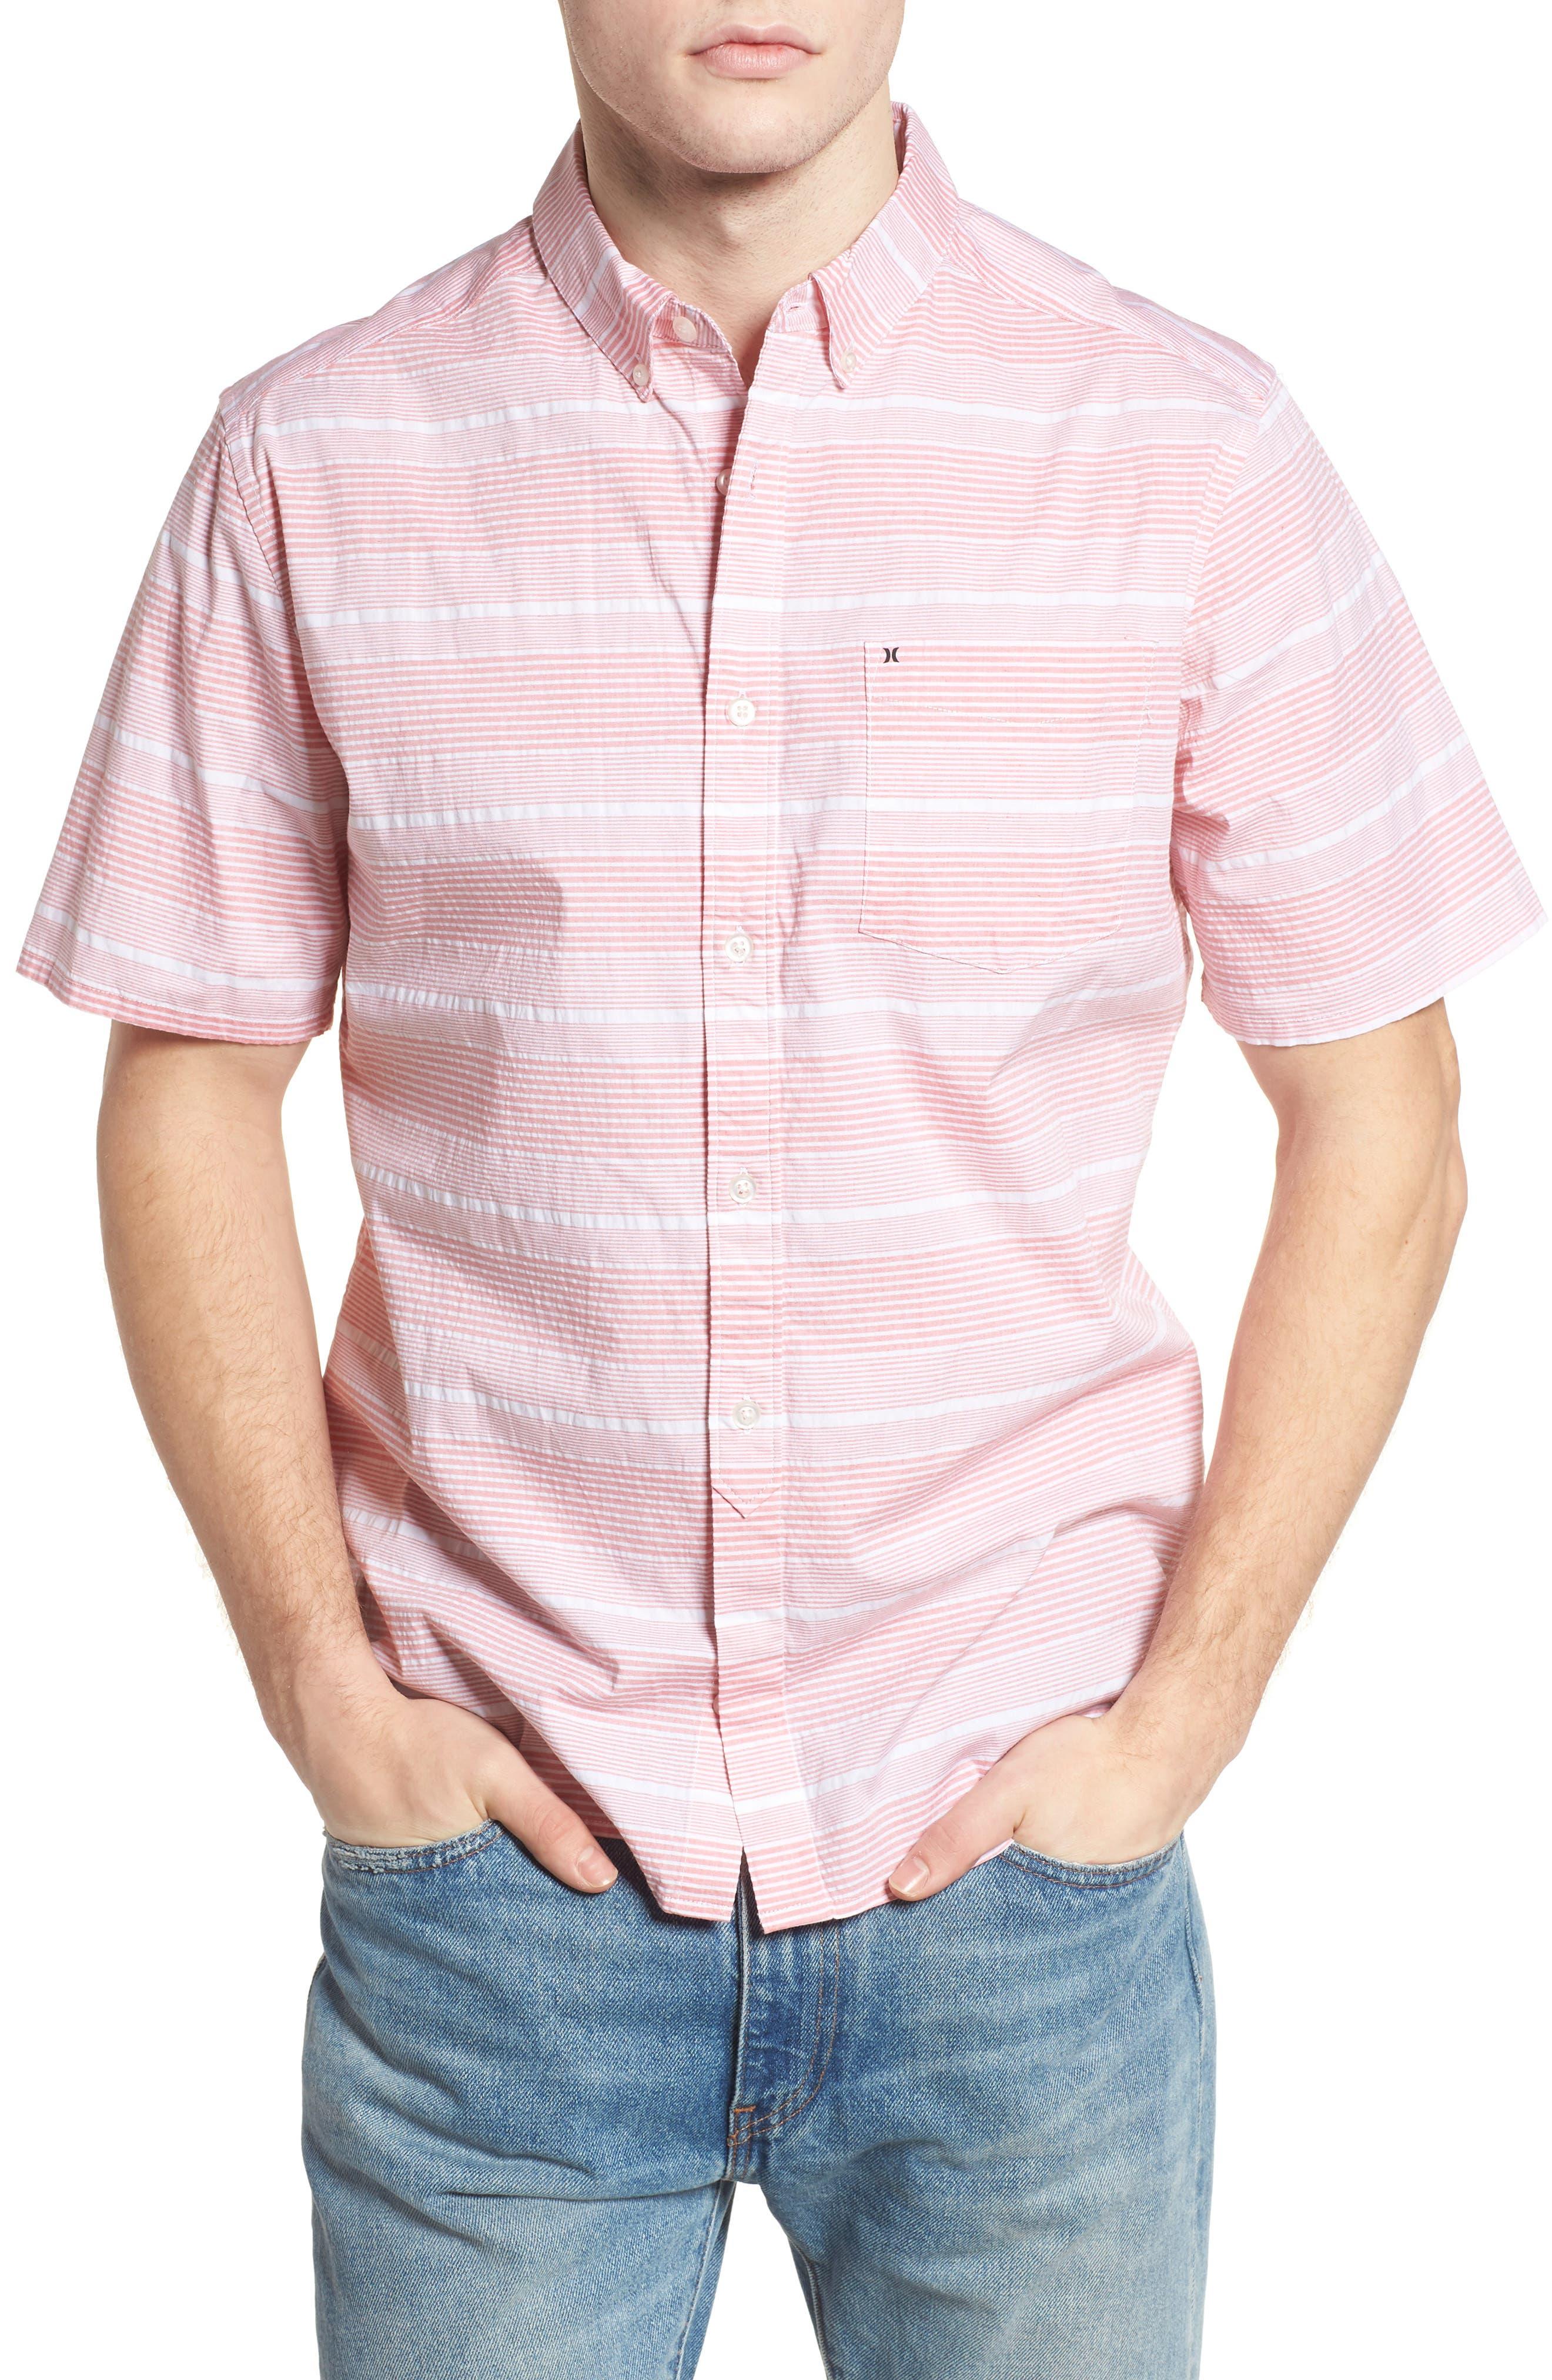 Surplus Short Sleeve Shirt,                             Main thumbnail 2, color,